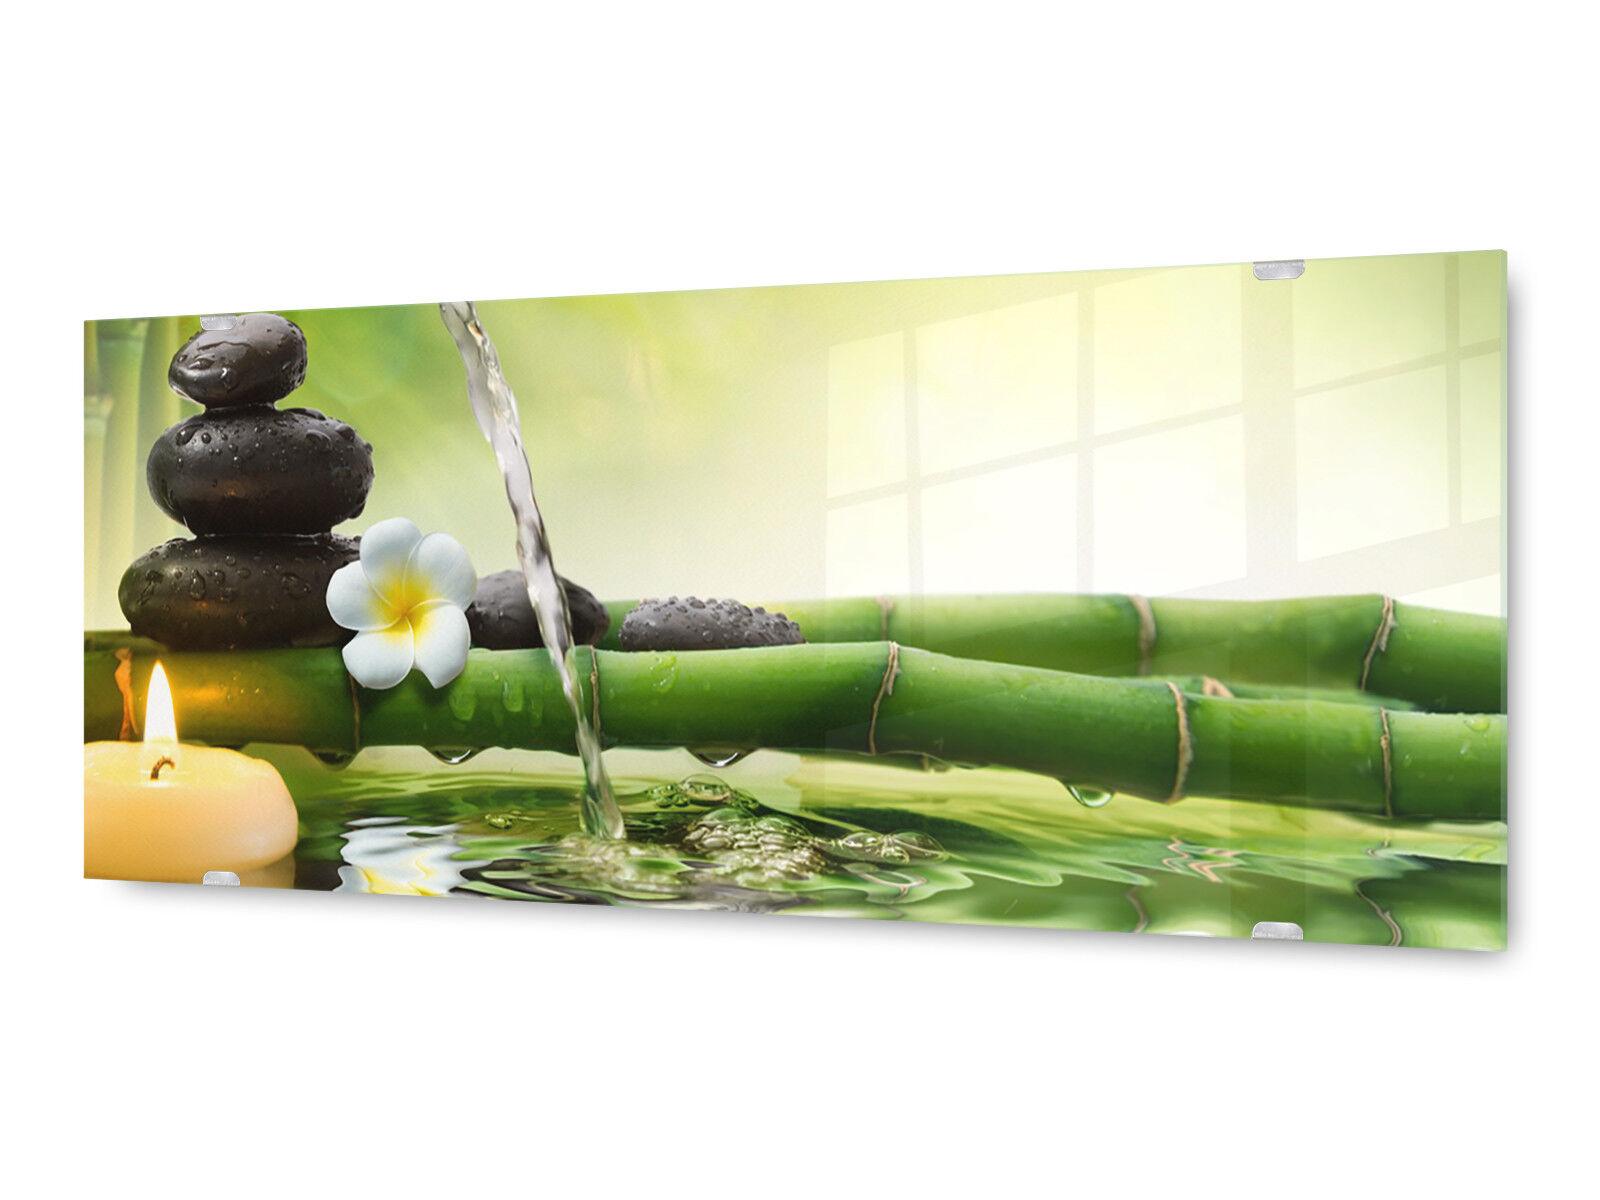 Image la fresque glx12568974257 Wellness Feng Shui 125 x 50 cm